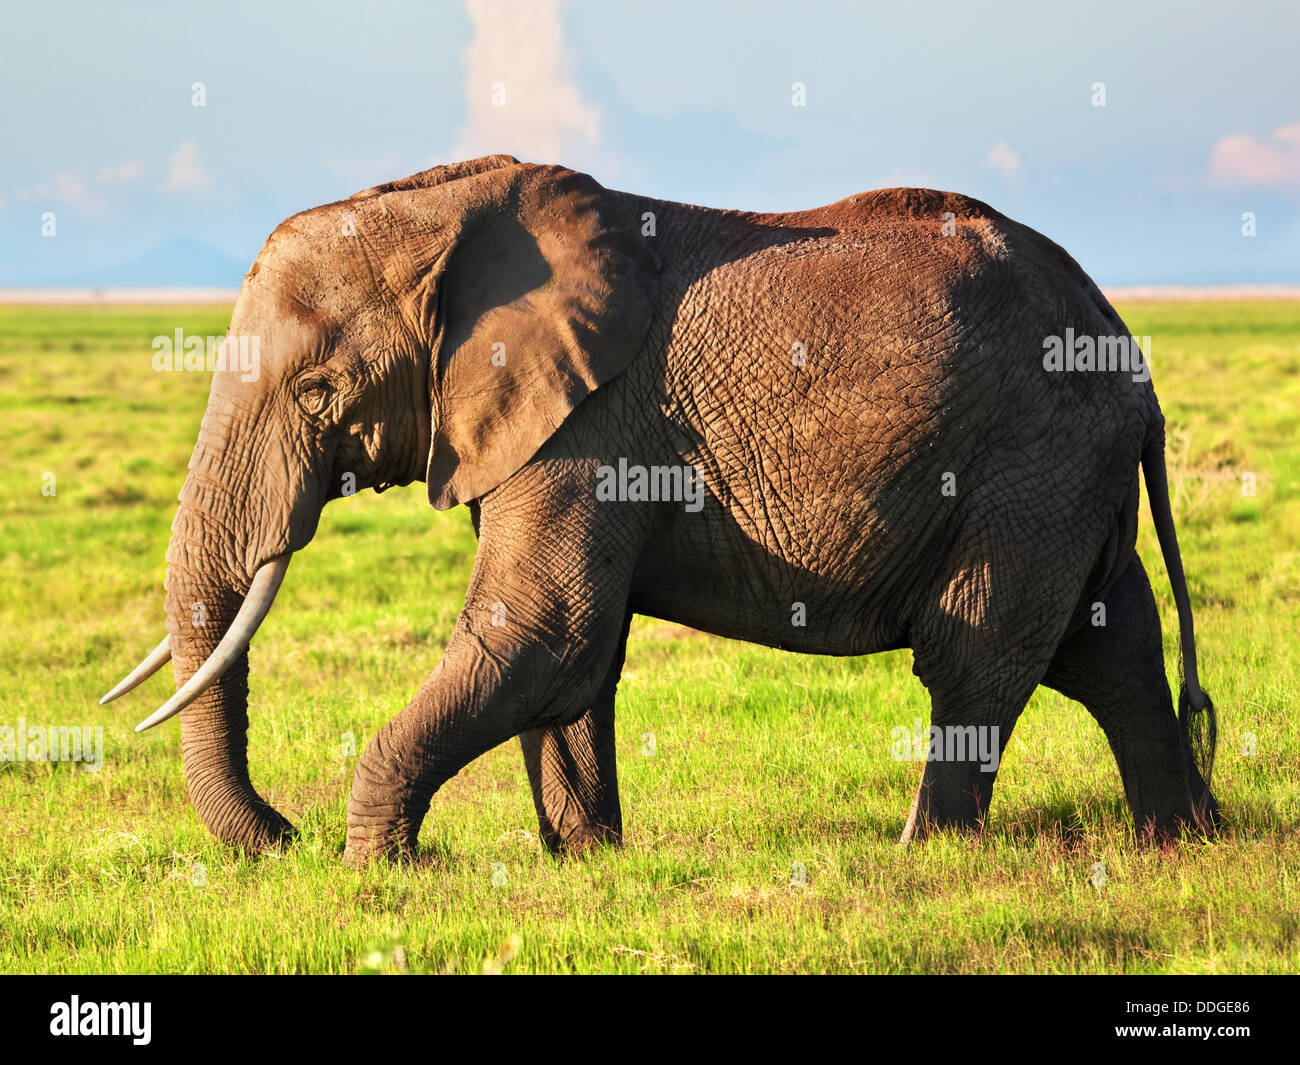 African Elephant (Loxodonta africana) portrait in Amboseli National Park, Rift Valley, Kenya, Africa - Stock Image